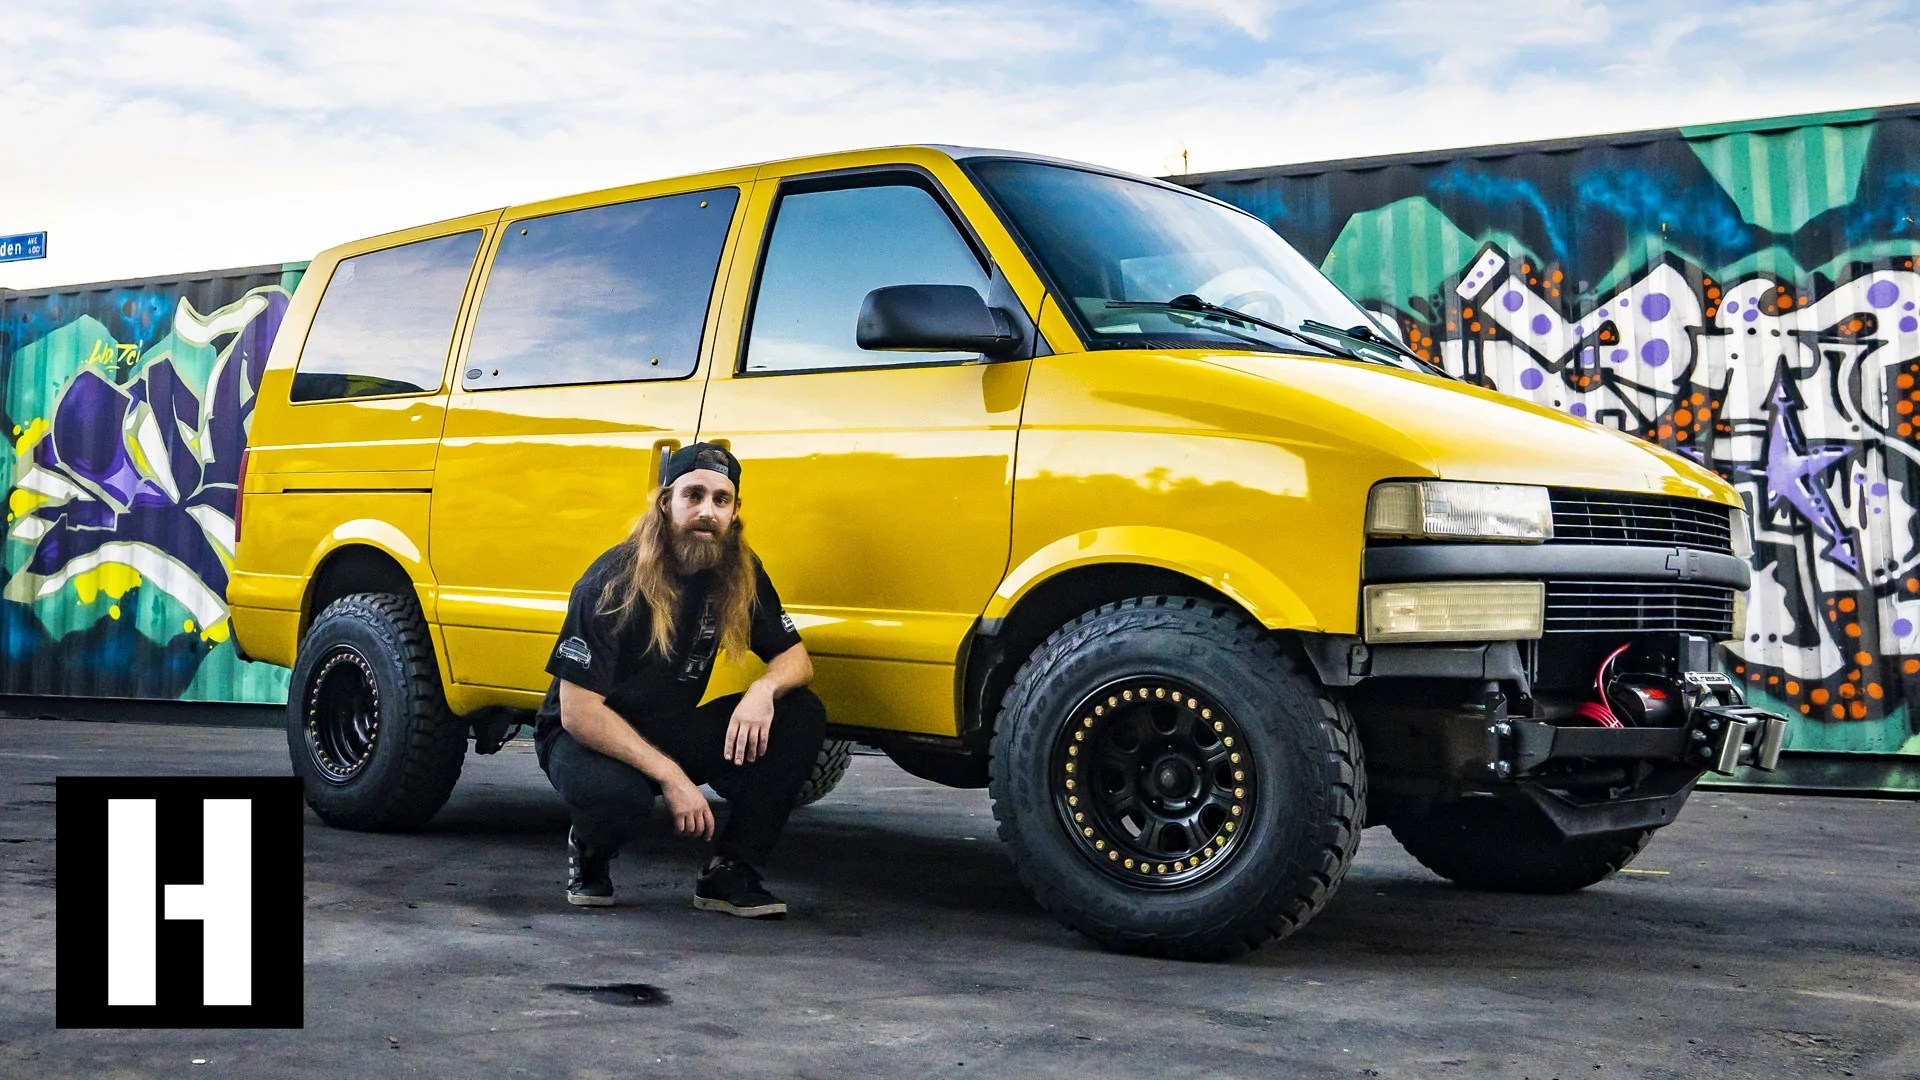 hight resolution of astro van to badasstro van our shreditor kyle s daily gets the safari hoonigan